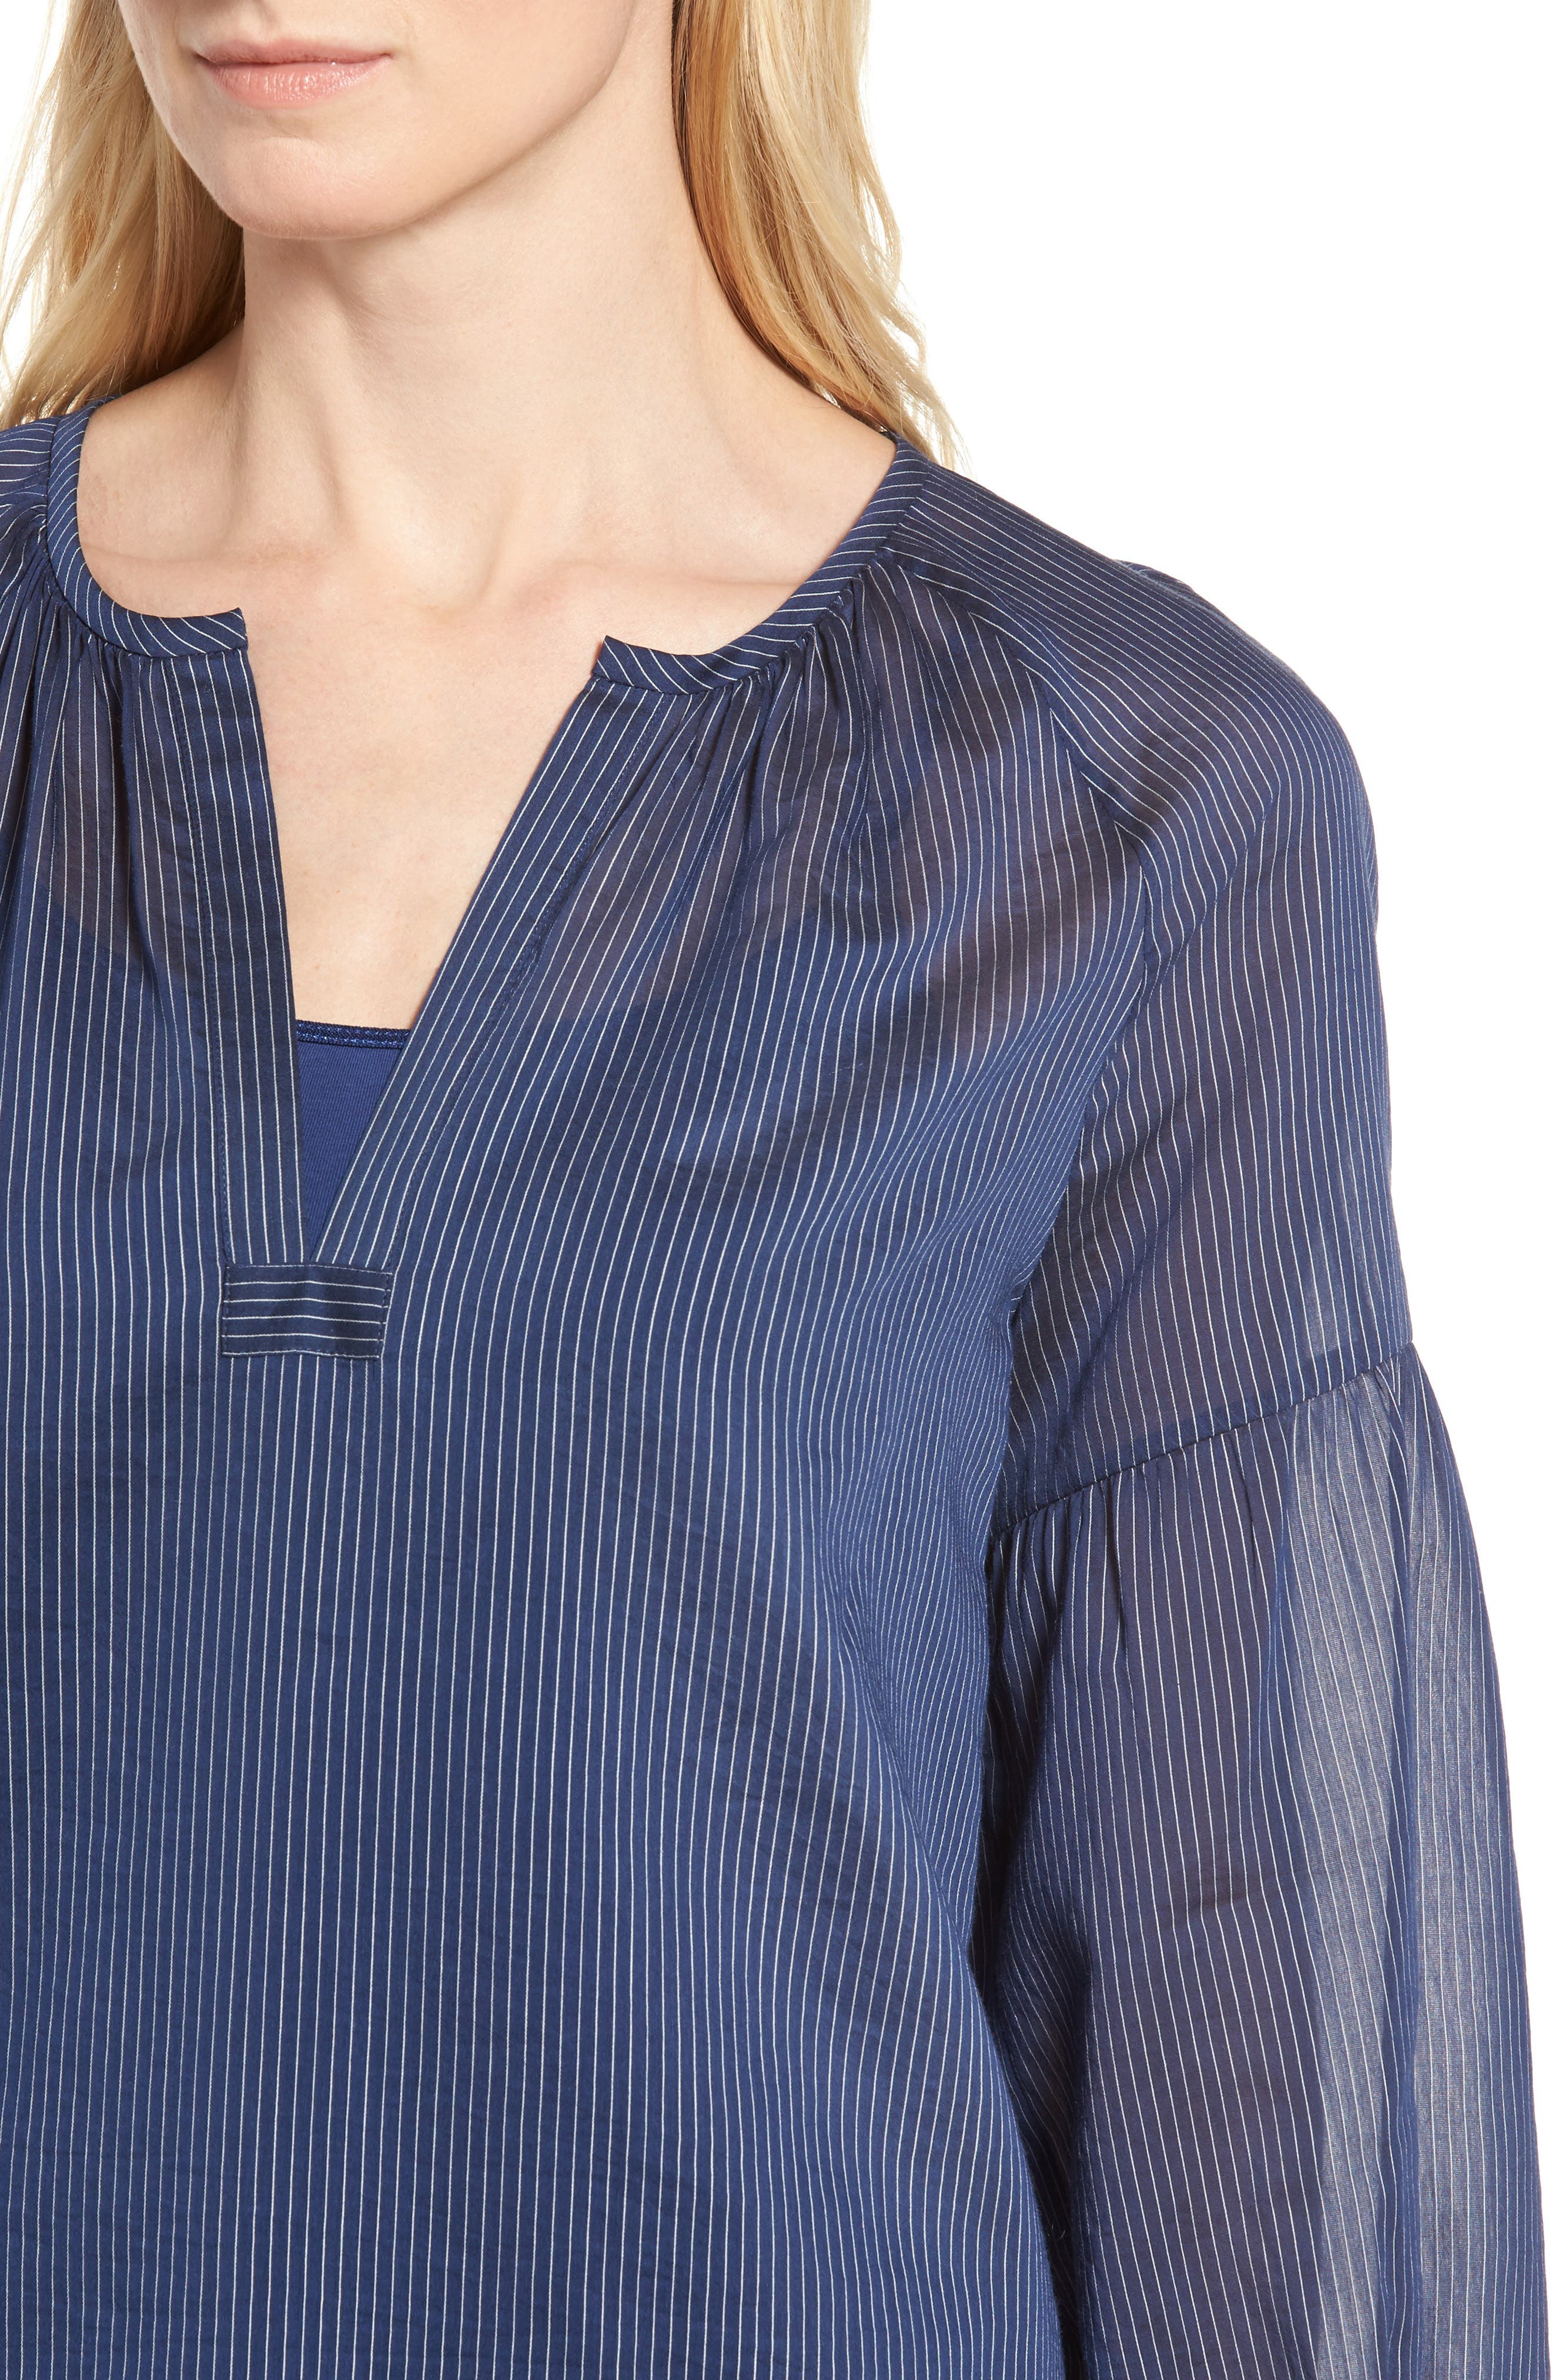 Stripe Cotton & Silk Top,                             Alternate thumbnail 4, color,                             410